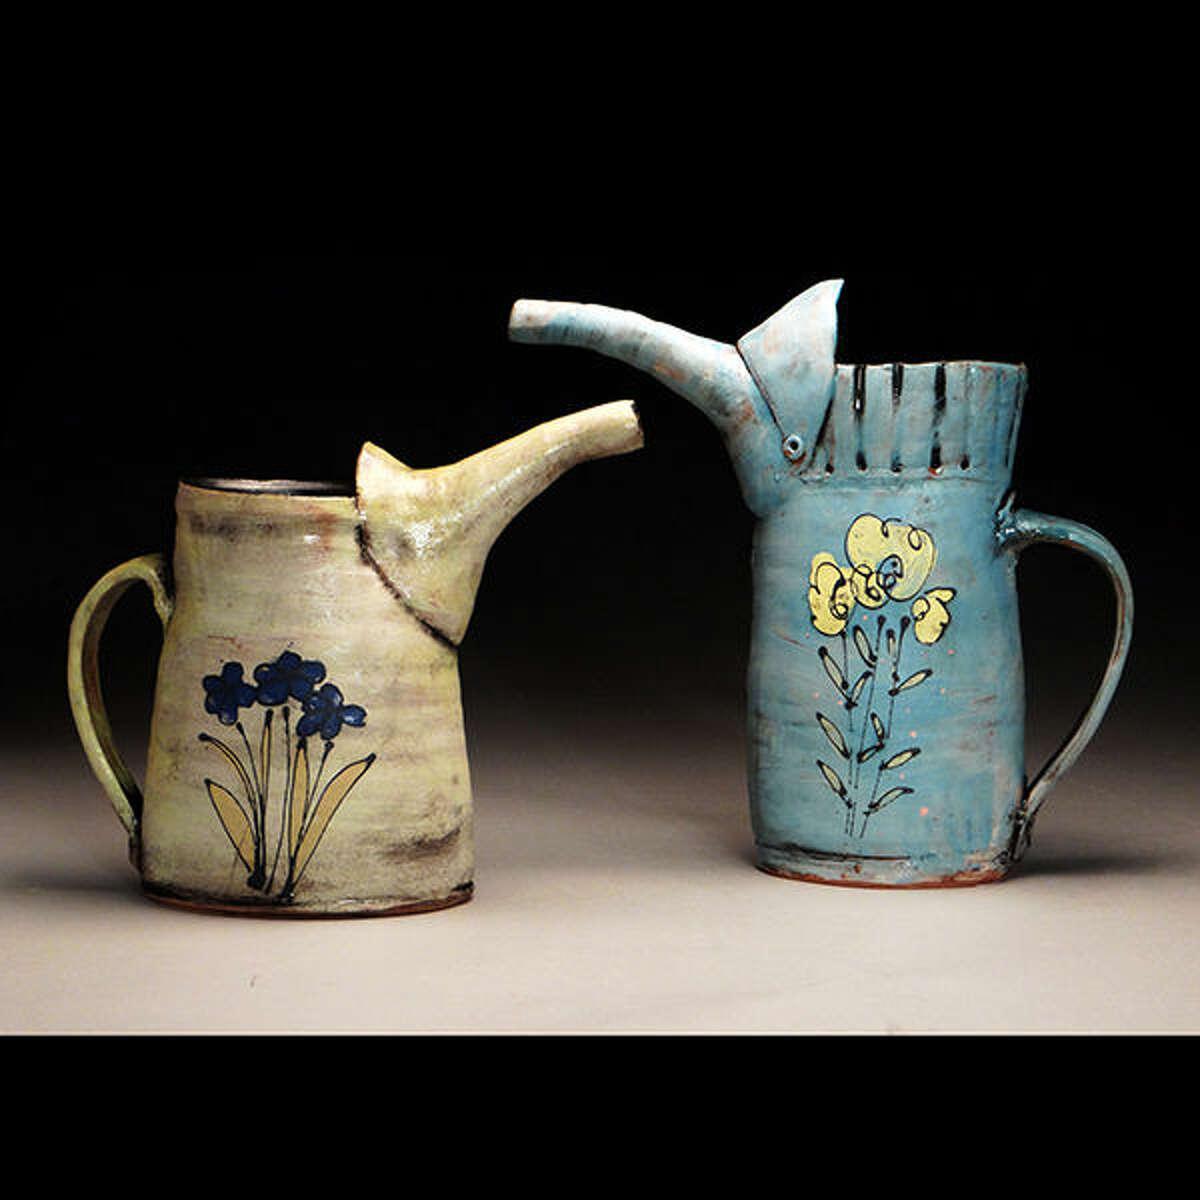 Two works by Susan Bostwick.